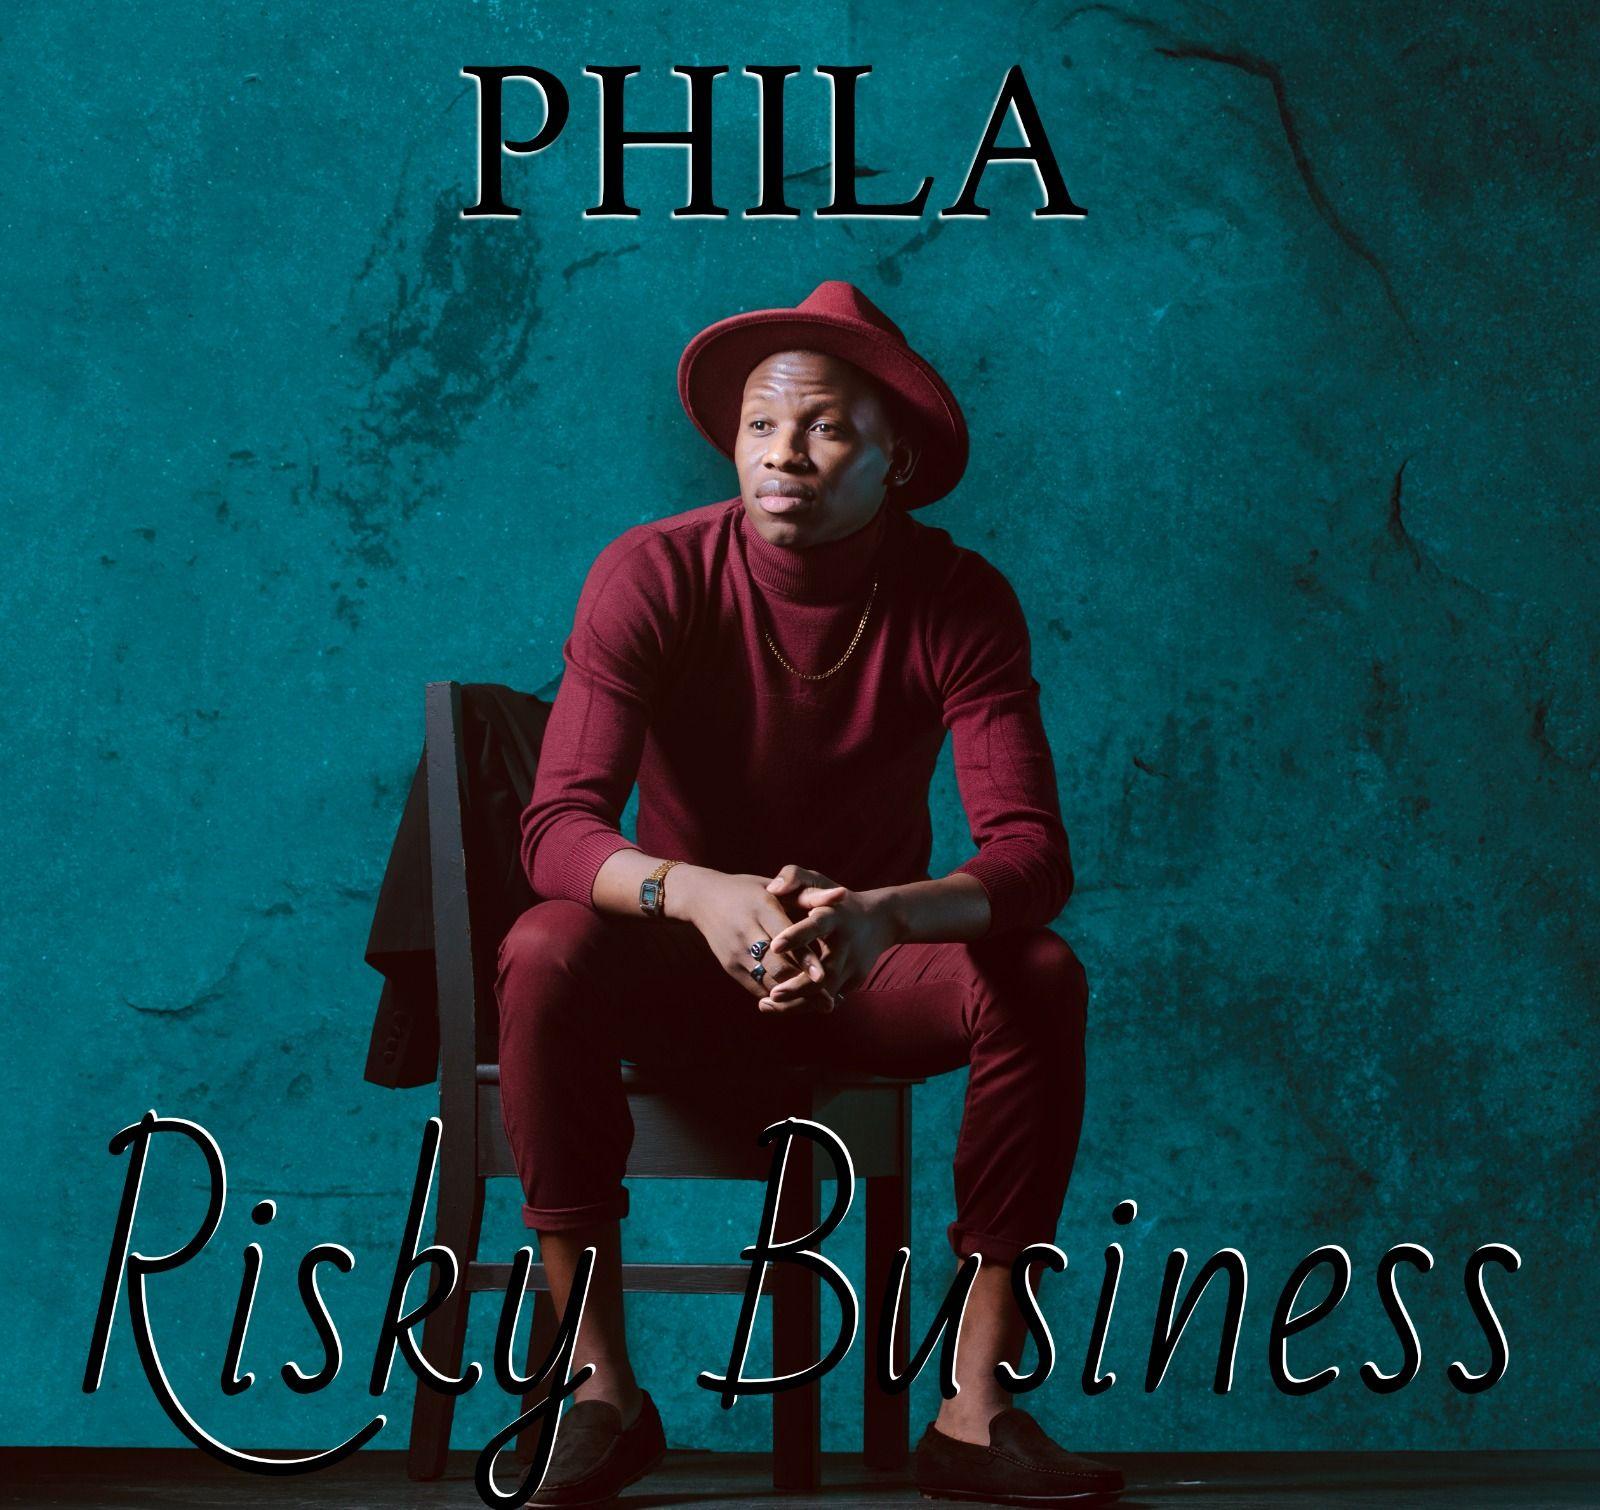 risky business by phila